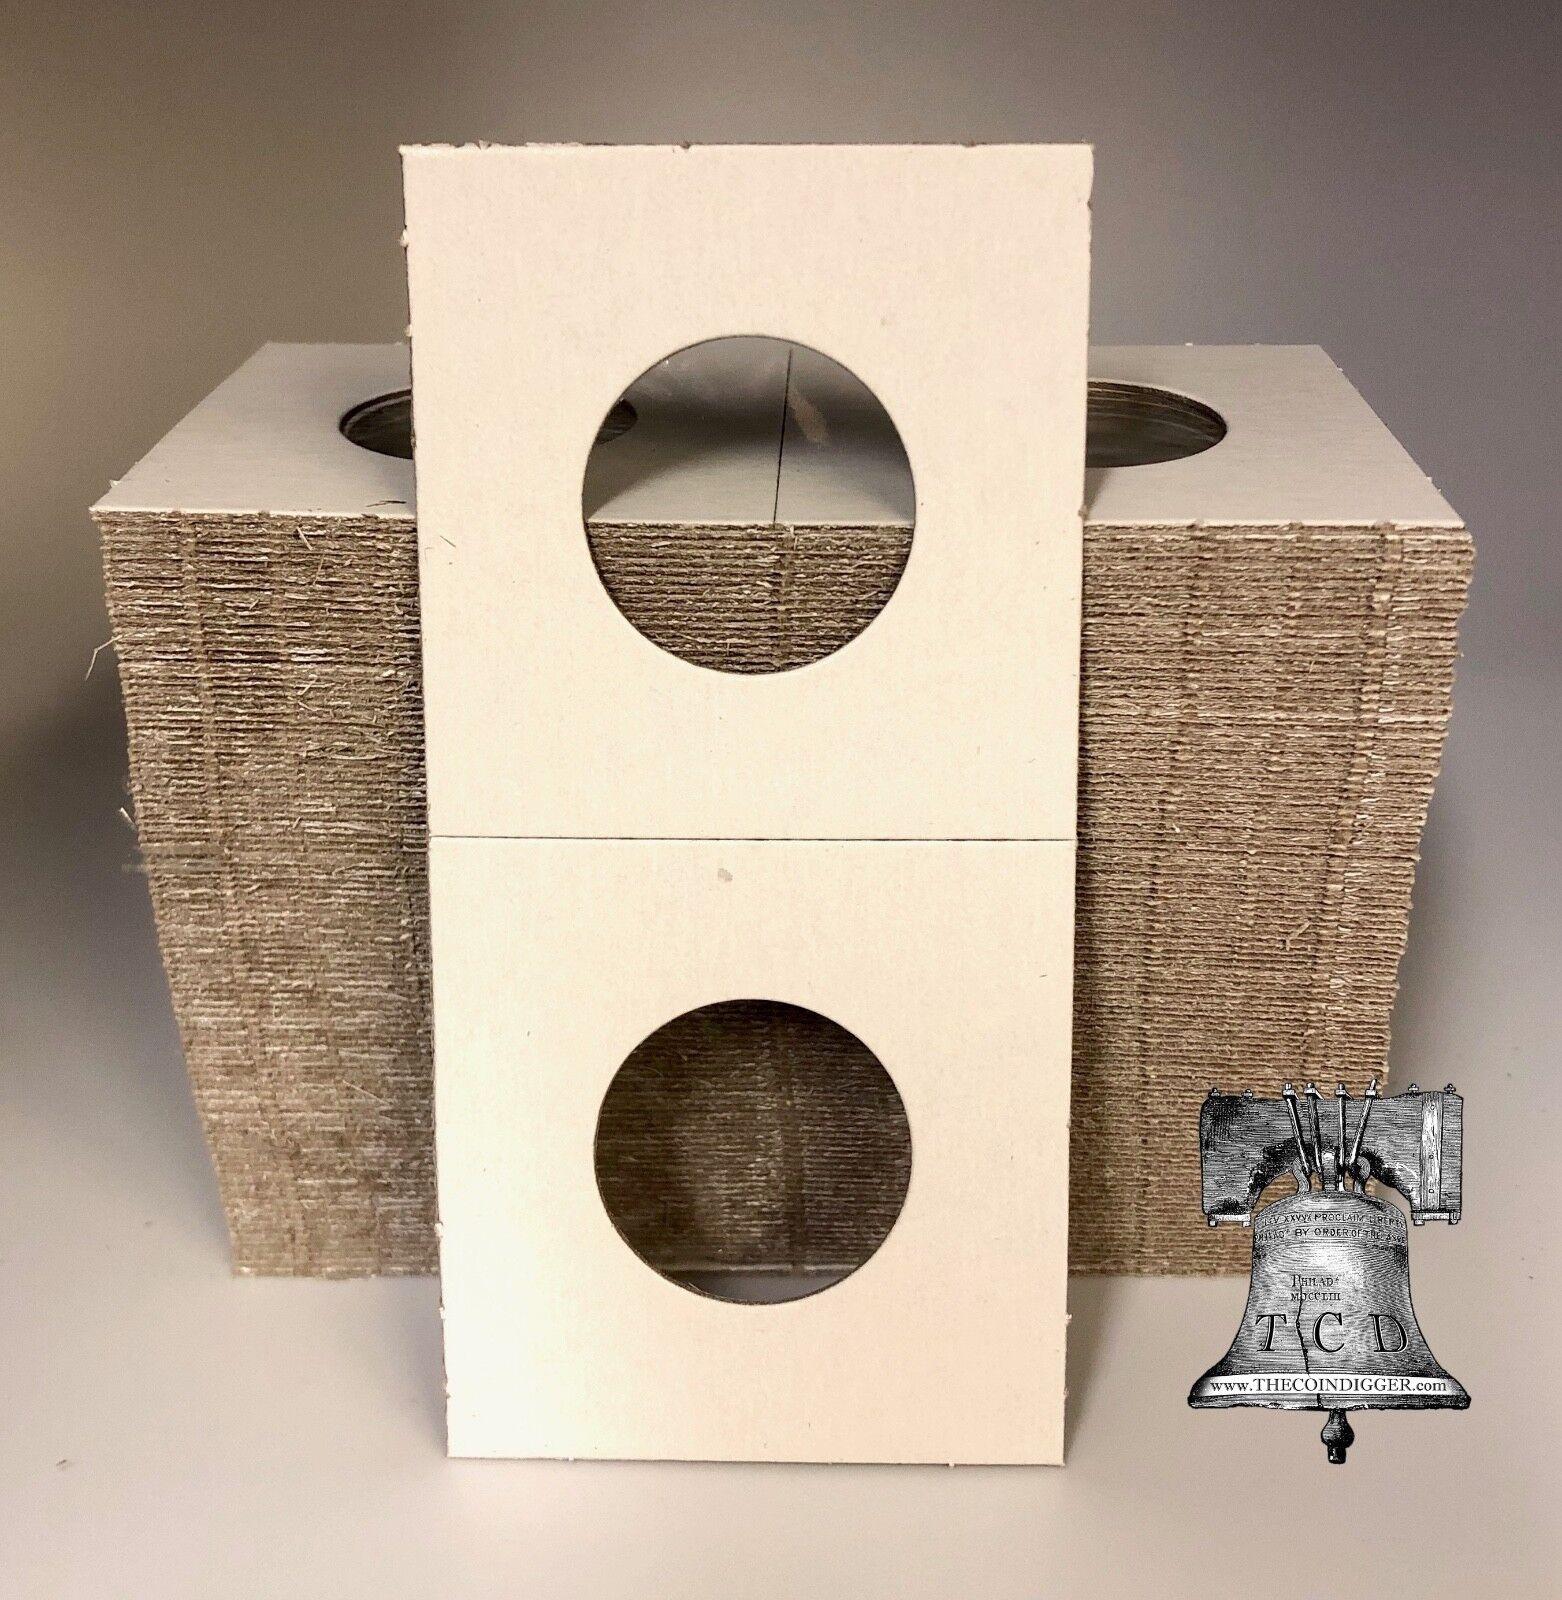 100 2x2 BARBER Dime Mylar Cardboard Display Coin Holder Flip BCW Storage Case